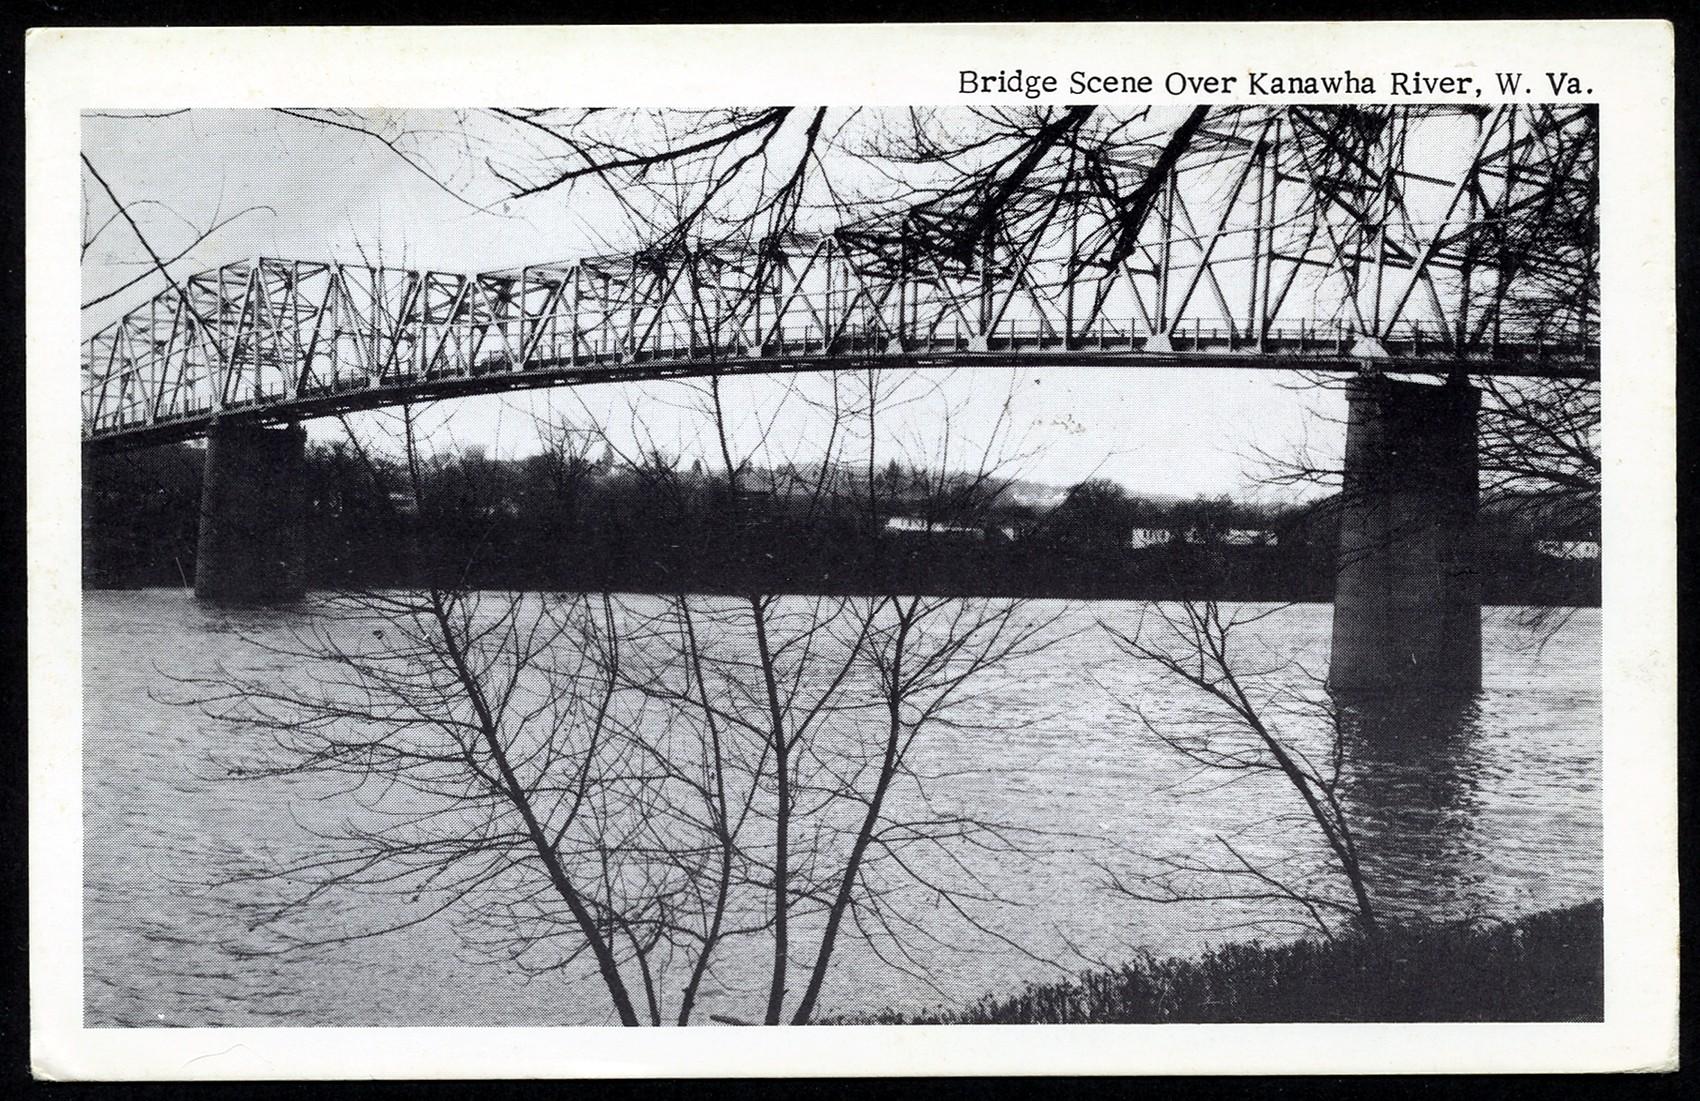 Orignal Saint Albans-Nitro Bridge